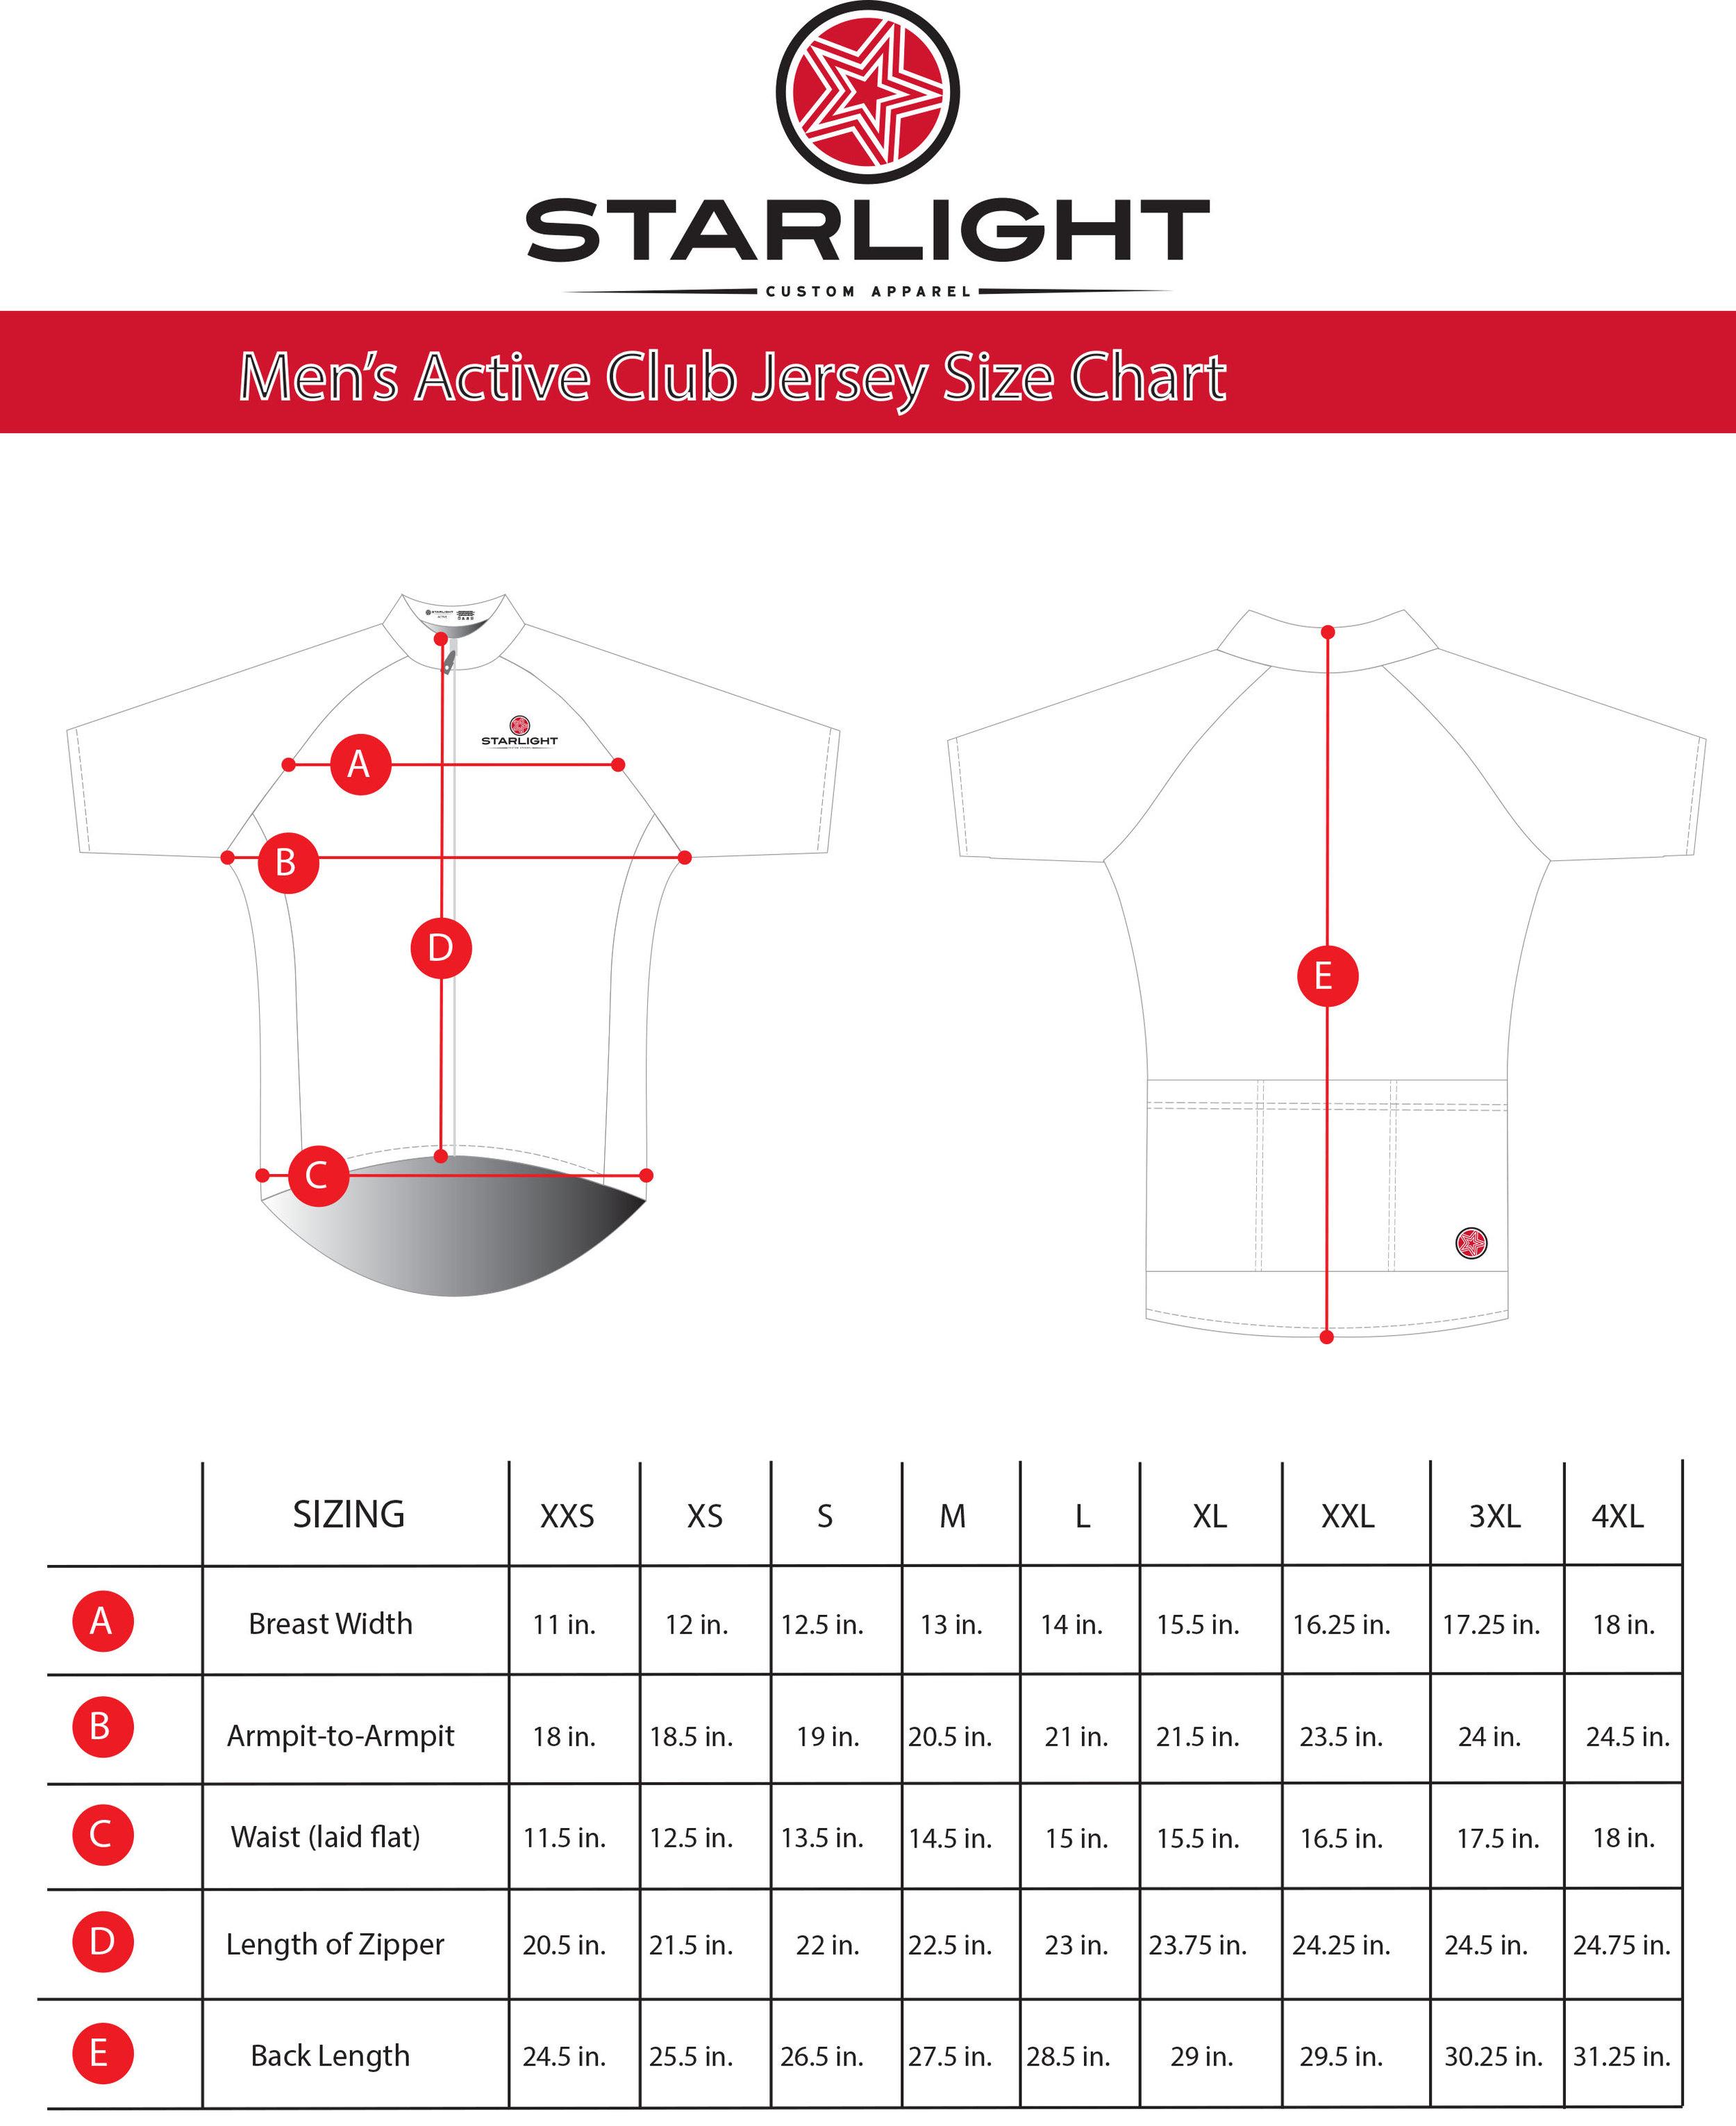 Men's Active Club Size Chart.jpg